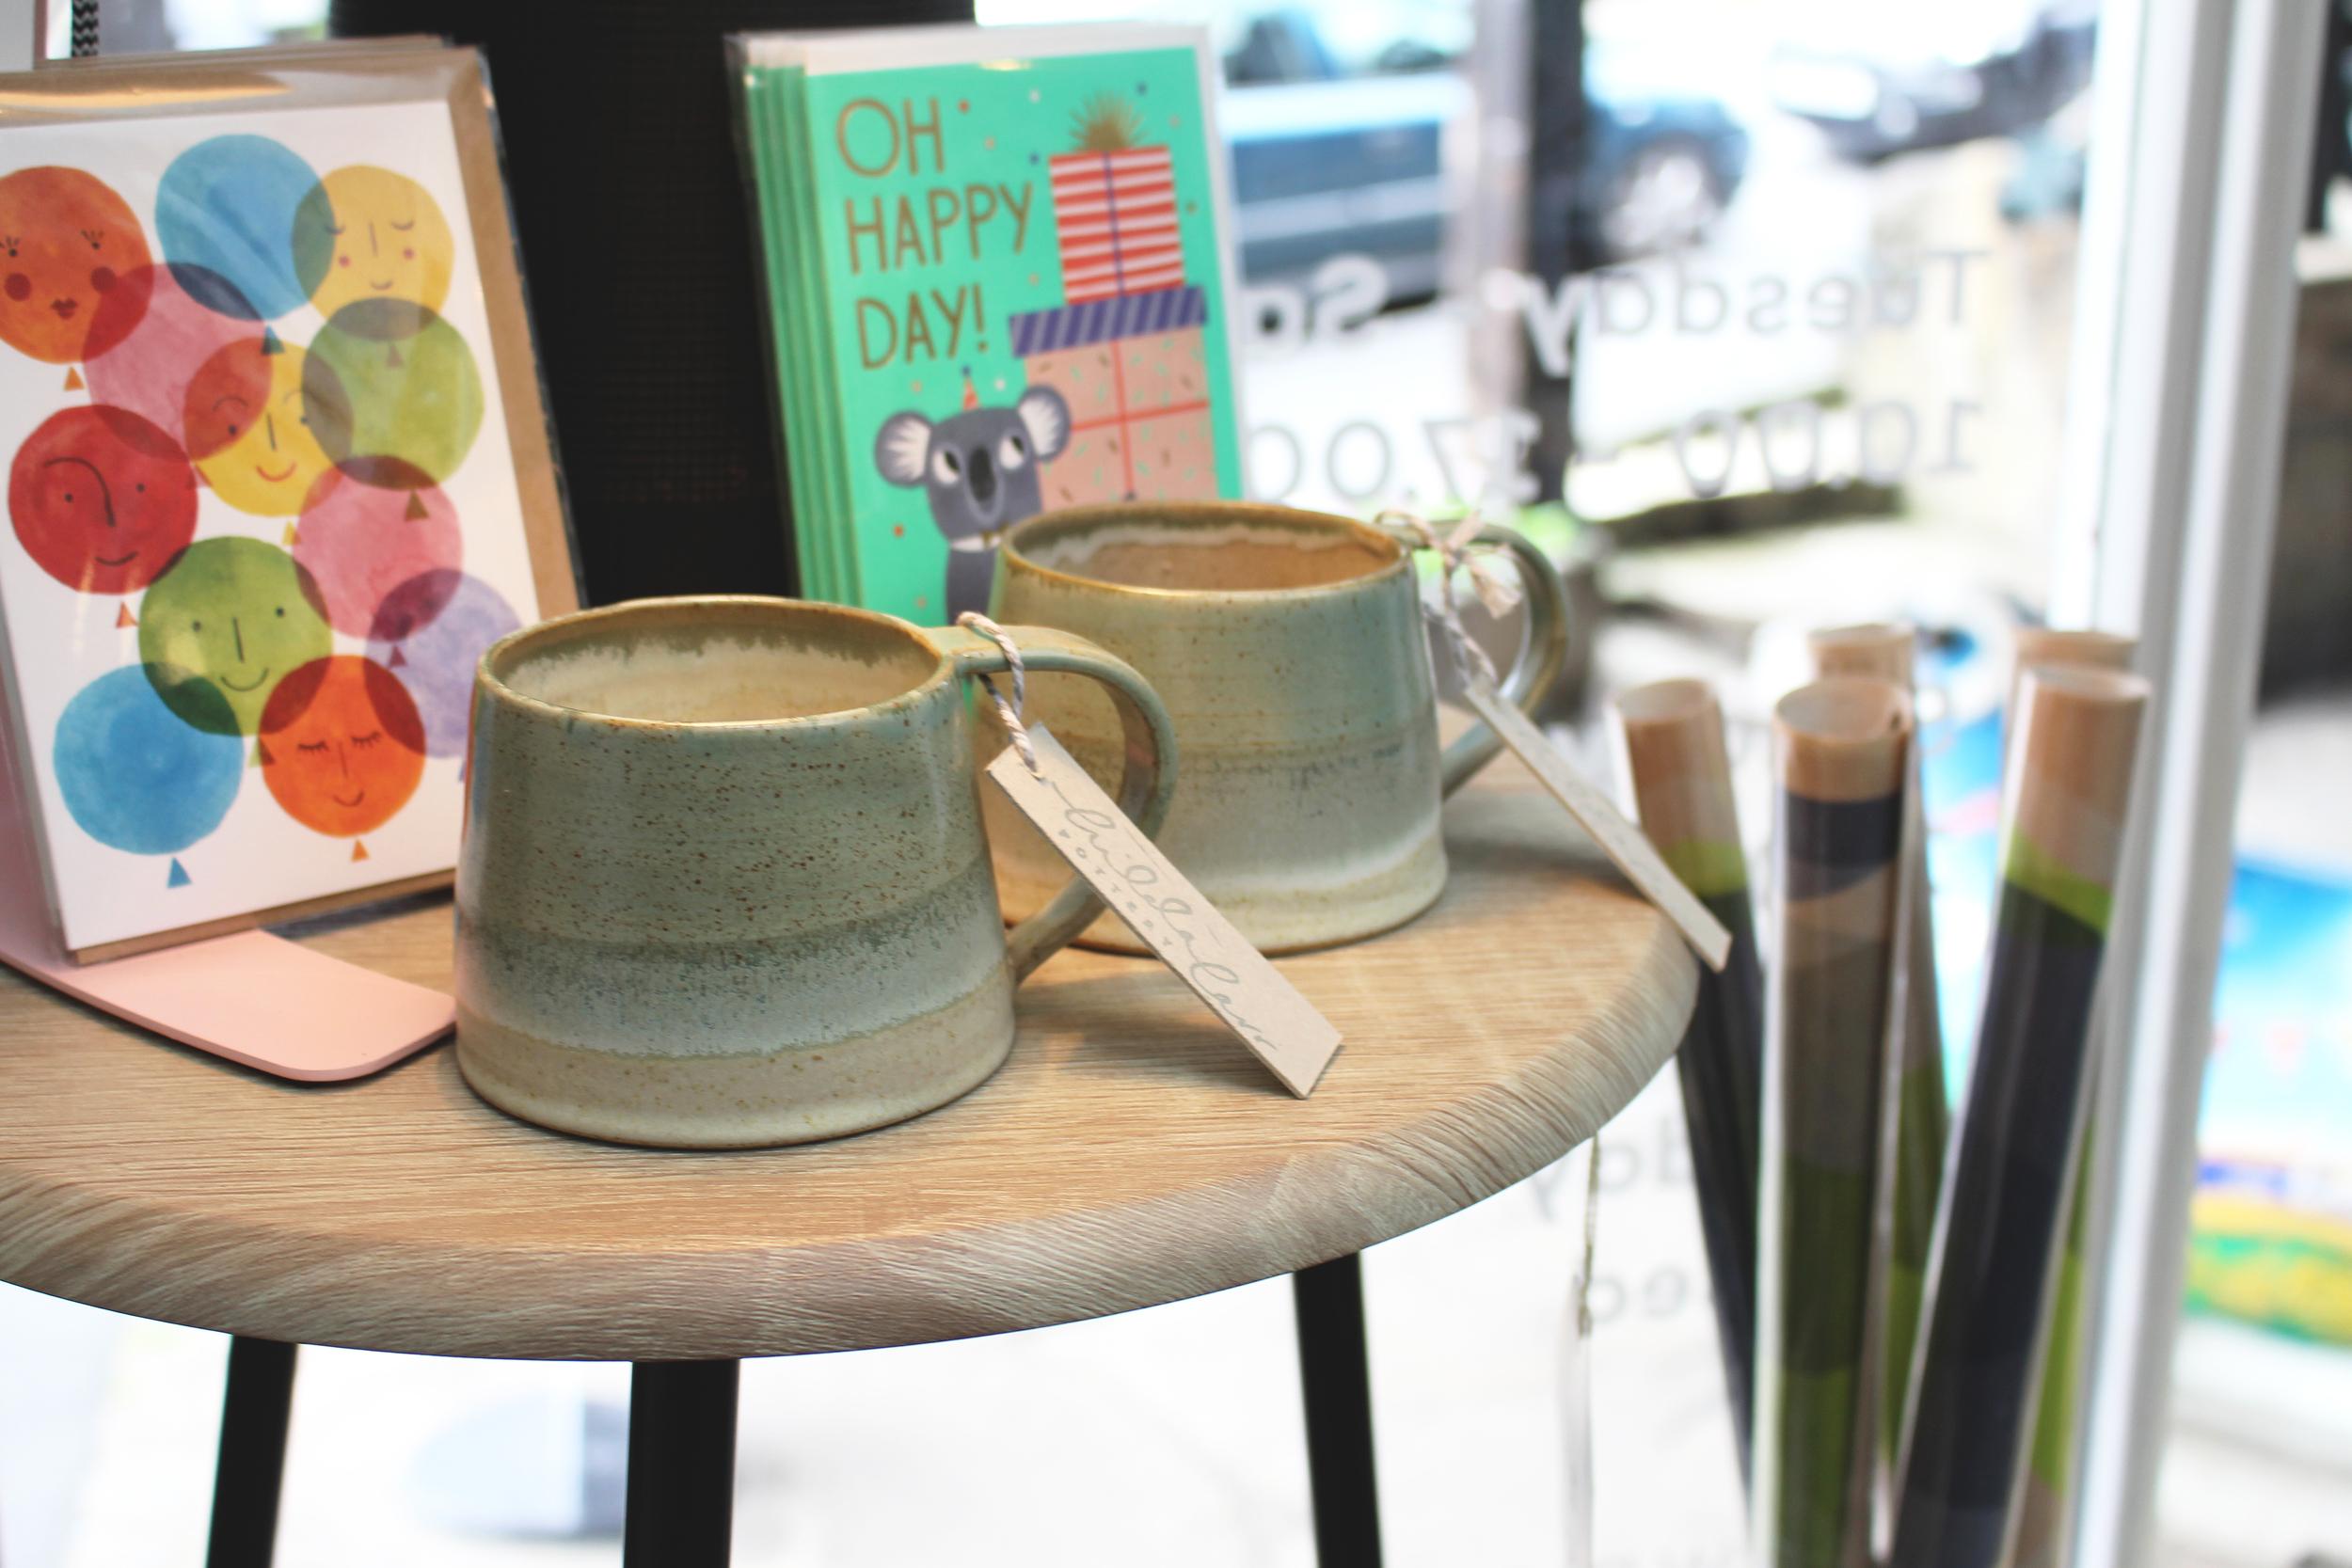 Celadon green mugs with glaze - £16 (each)